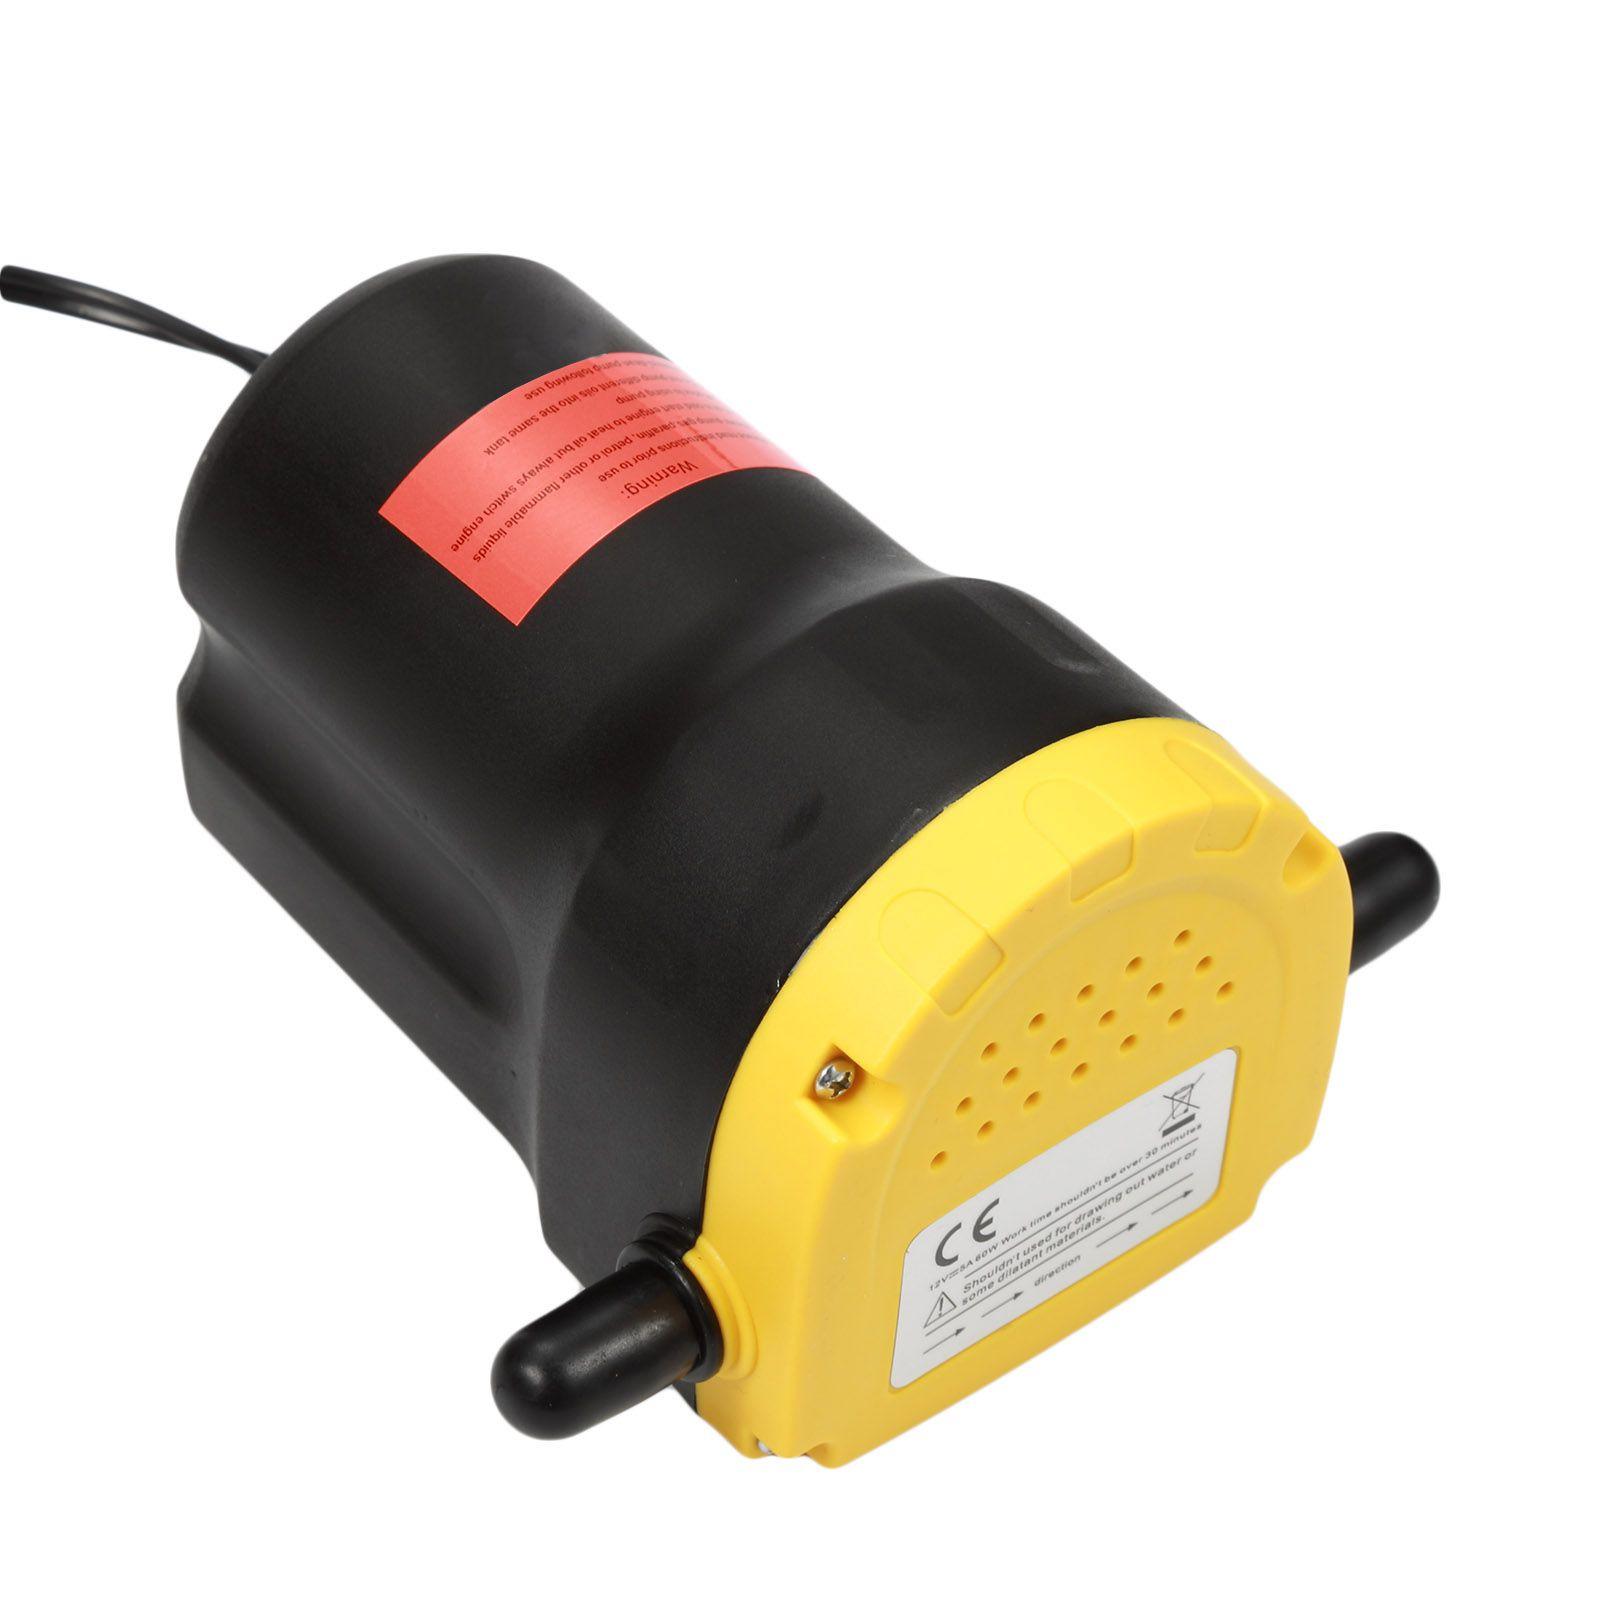 Pompe de vidange huile moteur par aspiration 12V Gr60016